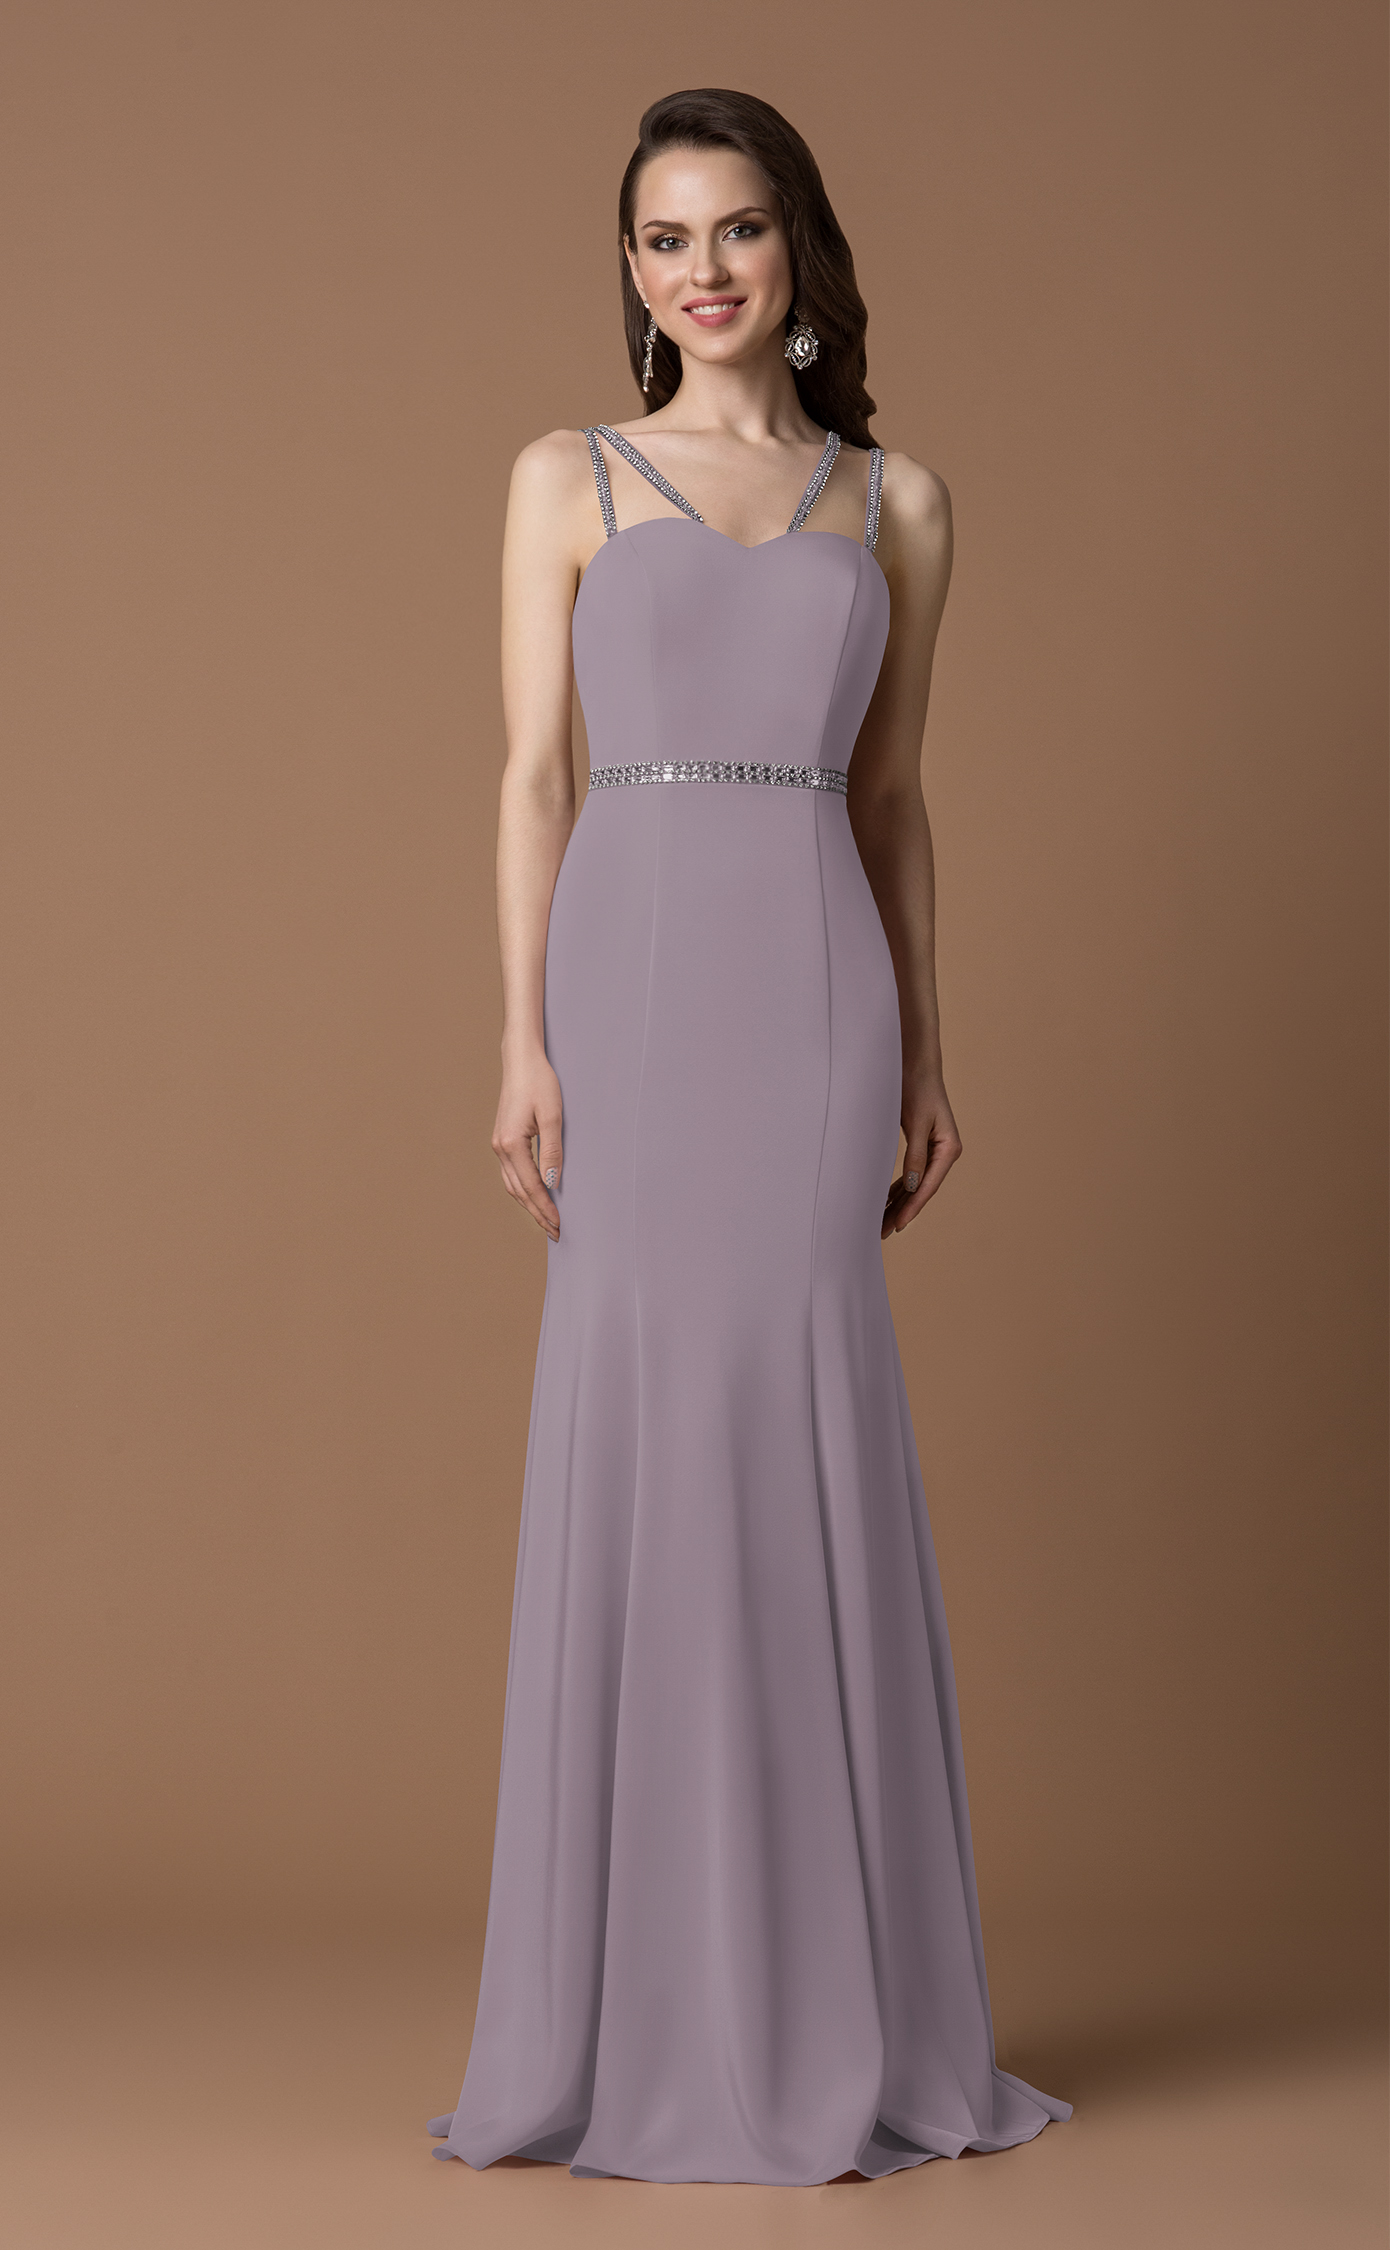 0a57d0b9d2 Gino Cerruti Long Satin Jersey Prom or Bridemaid Dress – 7017S Silver Rose